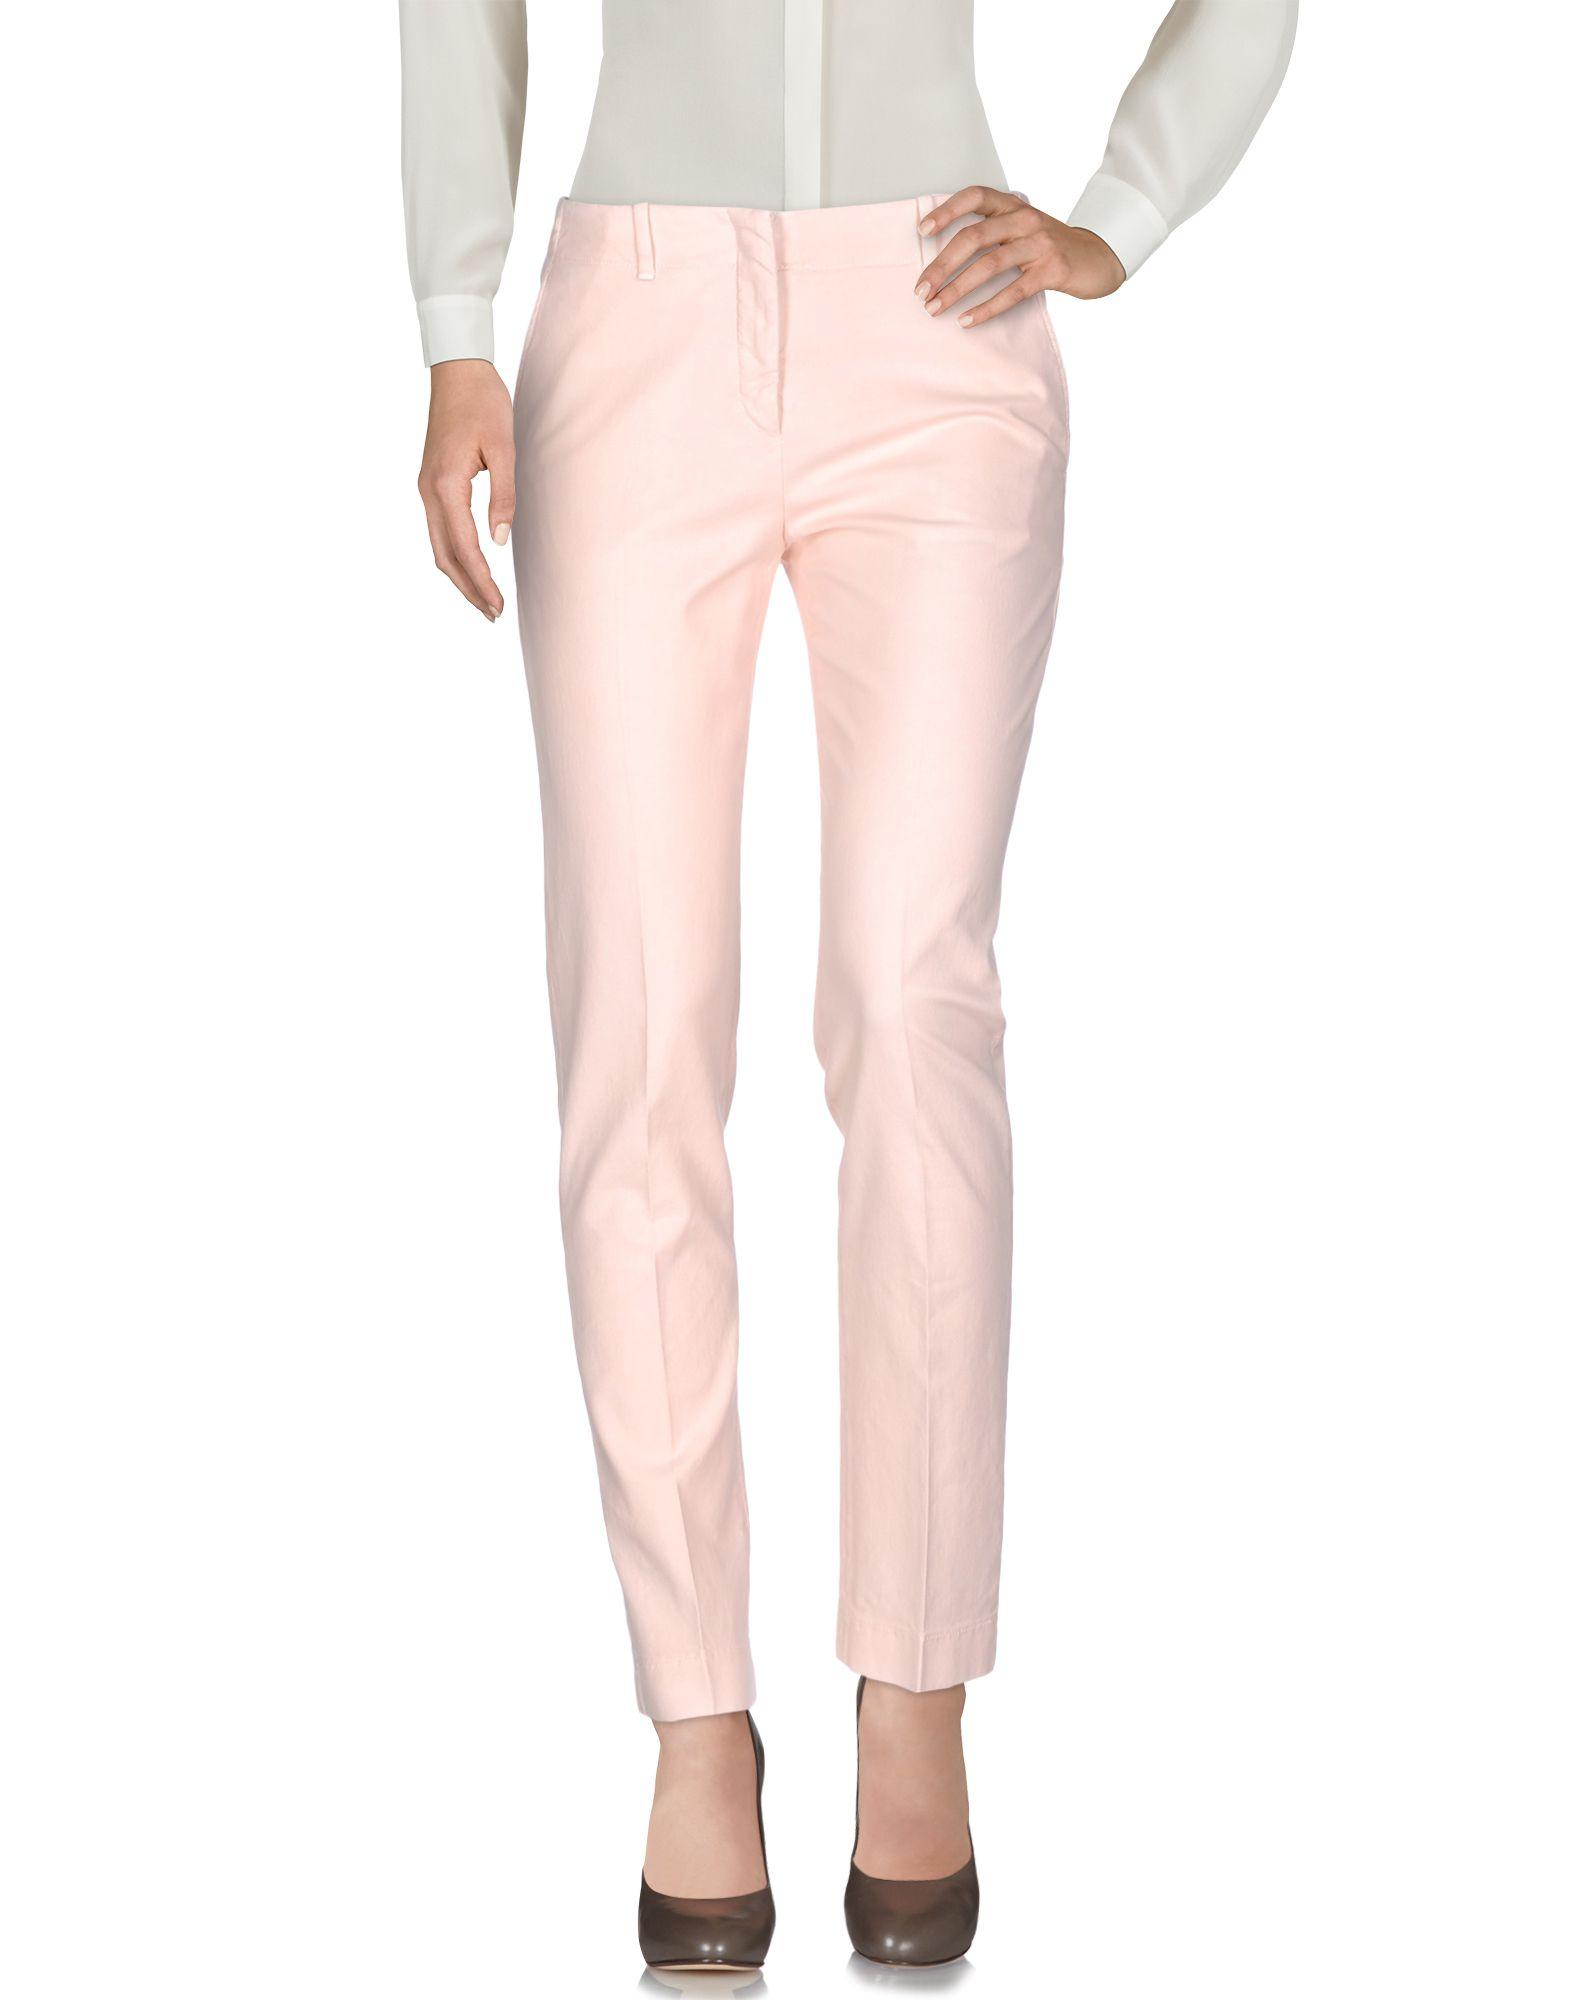 INCOTEX Damen Hose Farbe Rosa Größe 4 - broschei